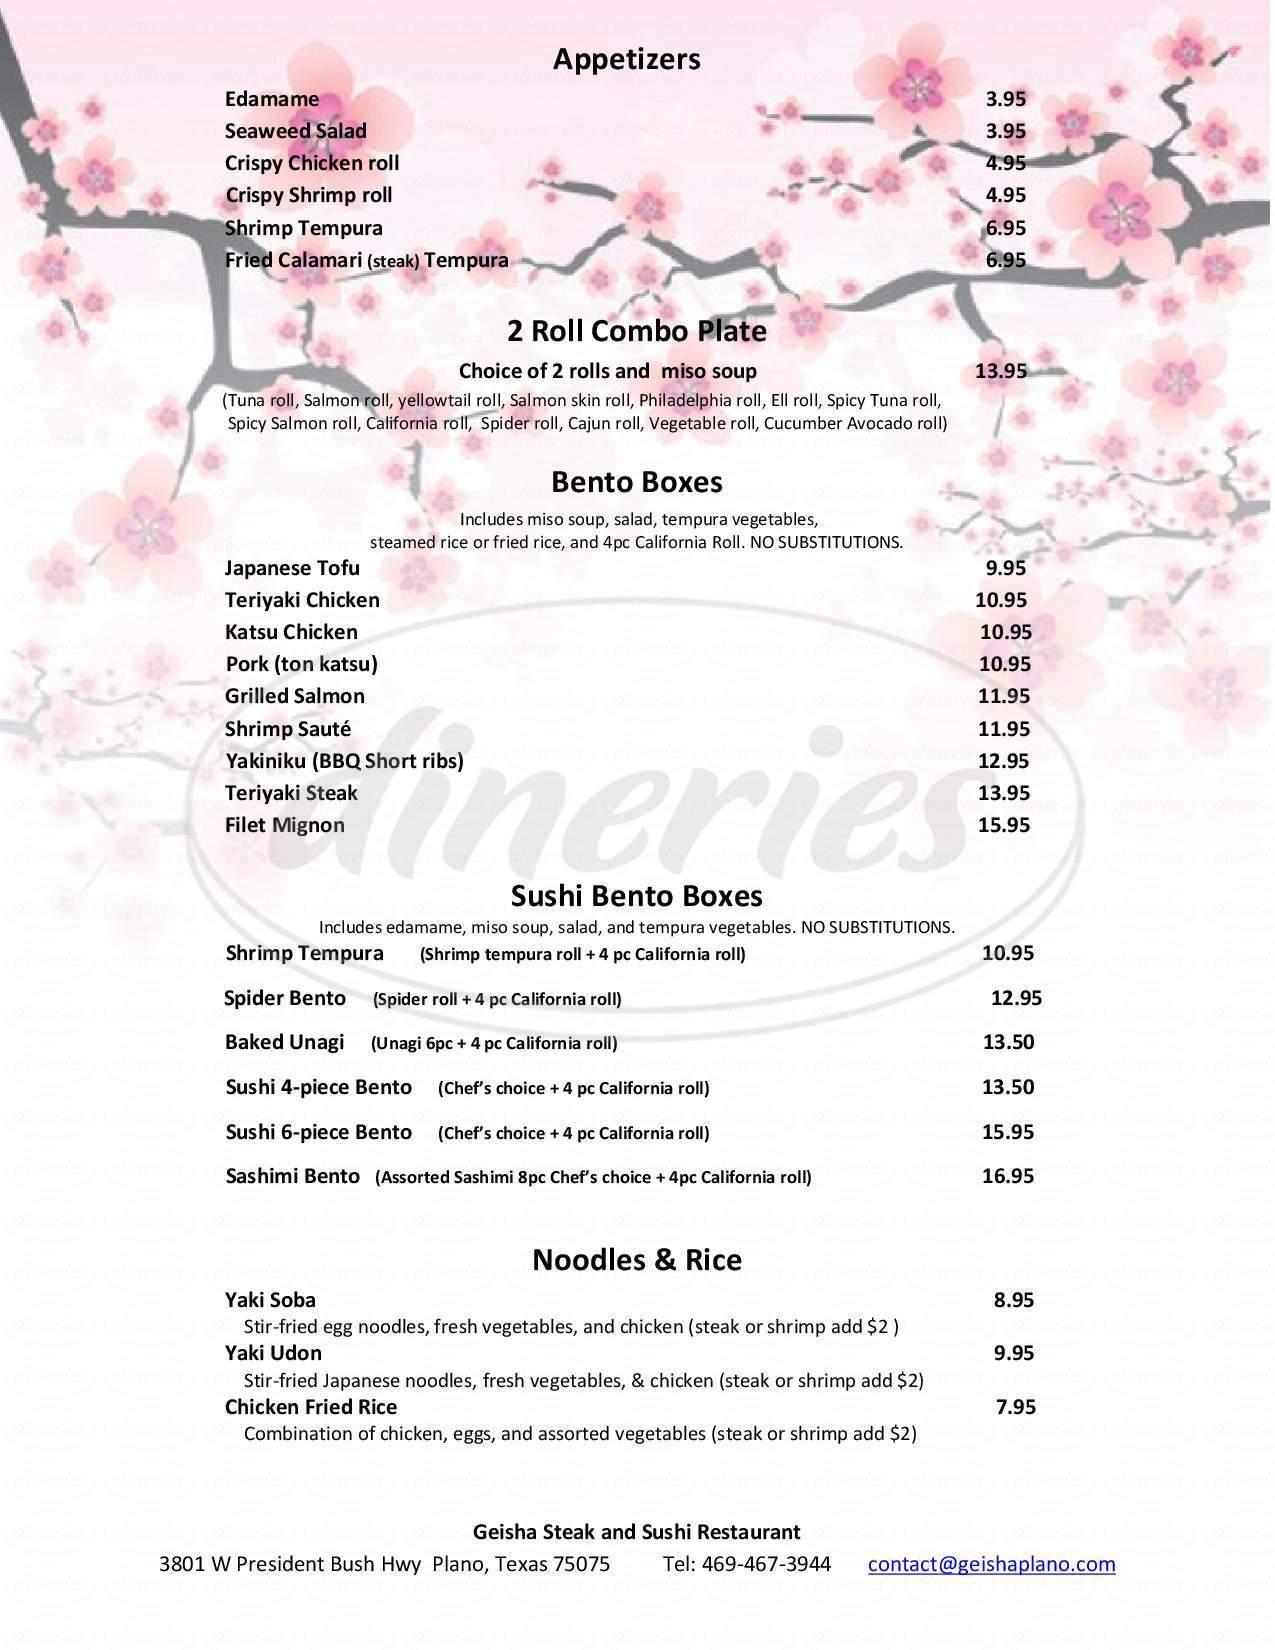 menu for Geisha Steak and Sushi